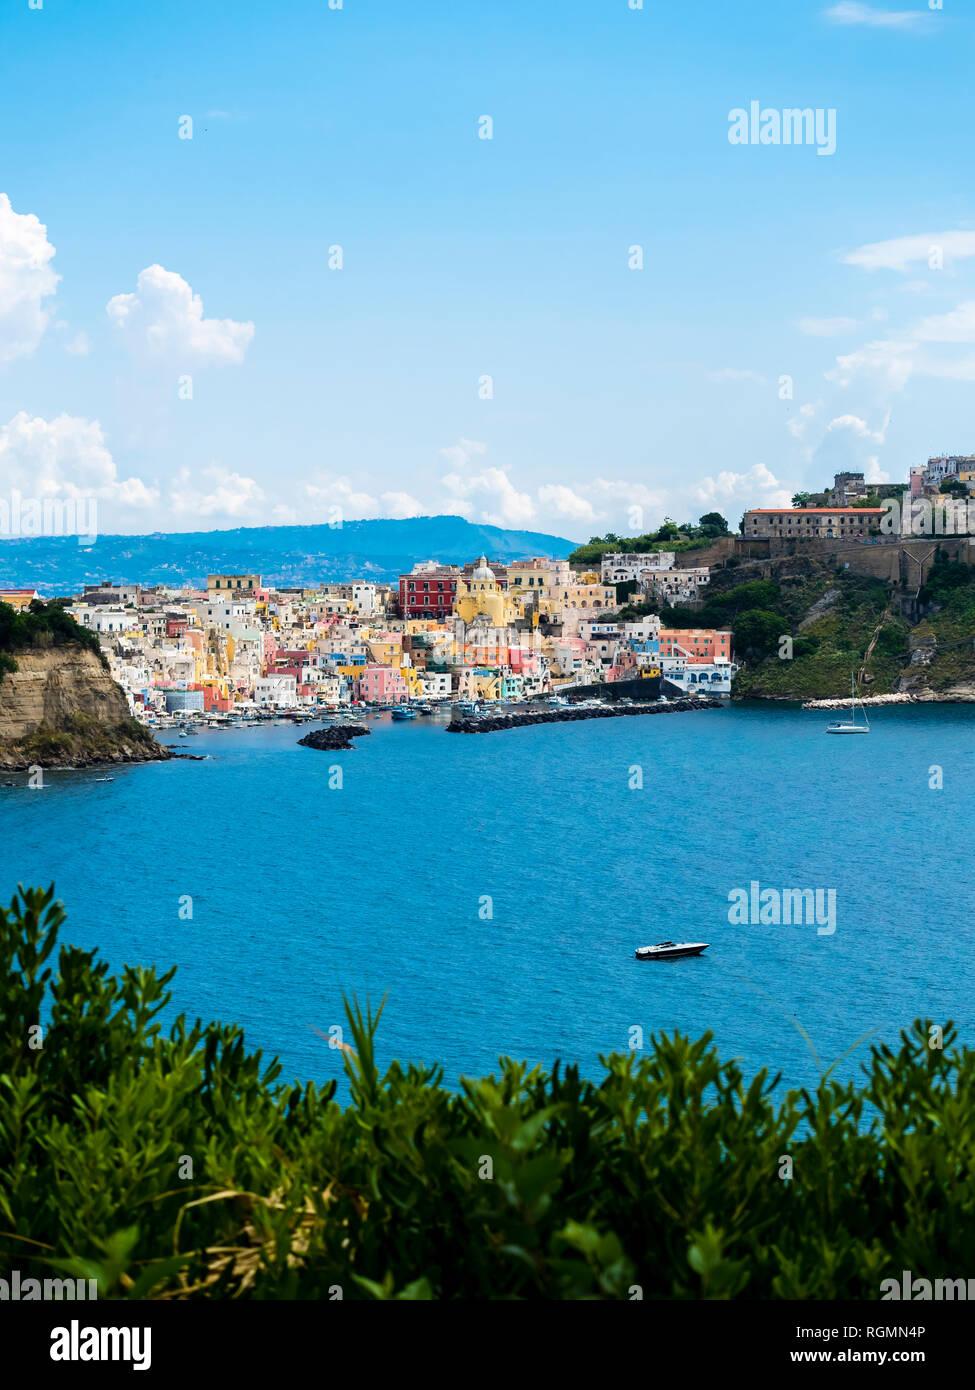 Italy, Campania, Gulf of Naples, Phlegraean Islands, Procida Island - Stock Image